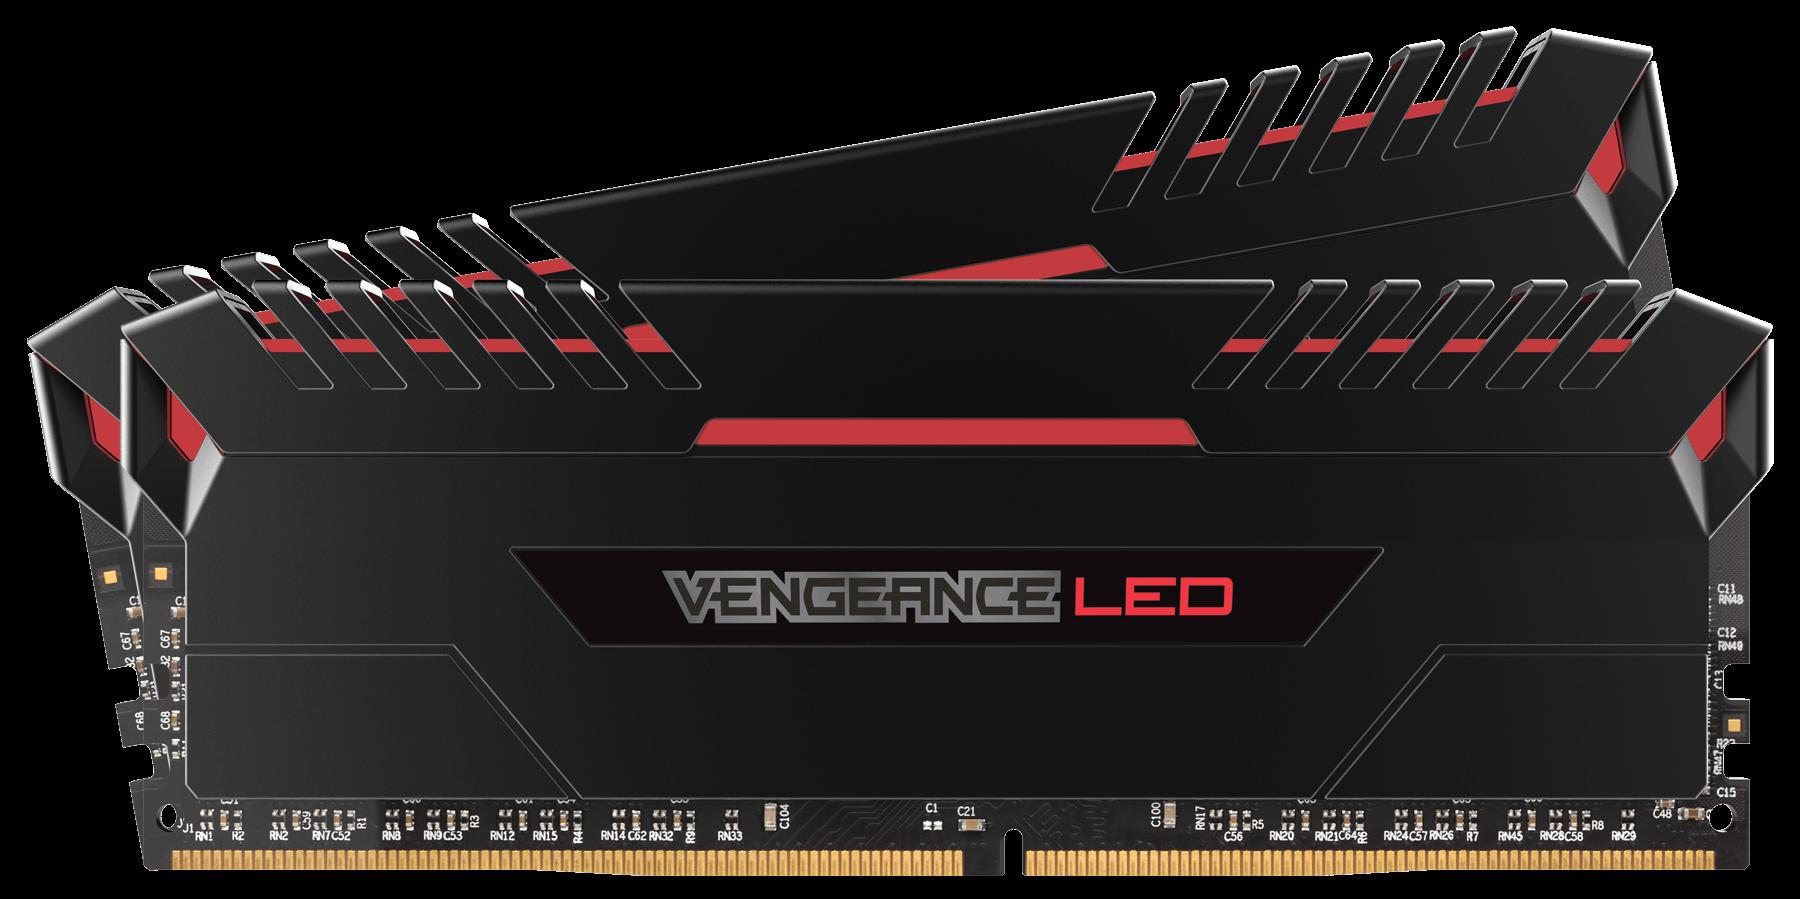 CORSAIR VENGEANCE LED RED 16GB (2x8GB) 3200Mhz DDR4 CL16 Pc Ram CMU16GX4M2C3200C16R